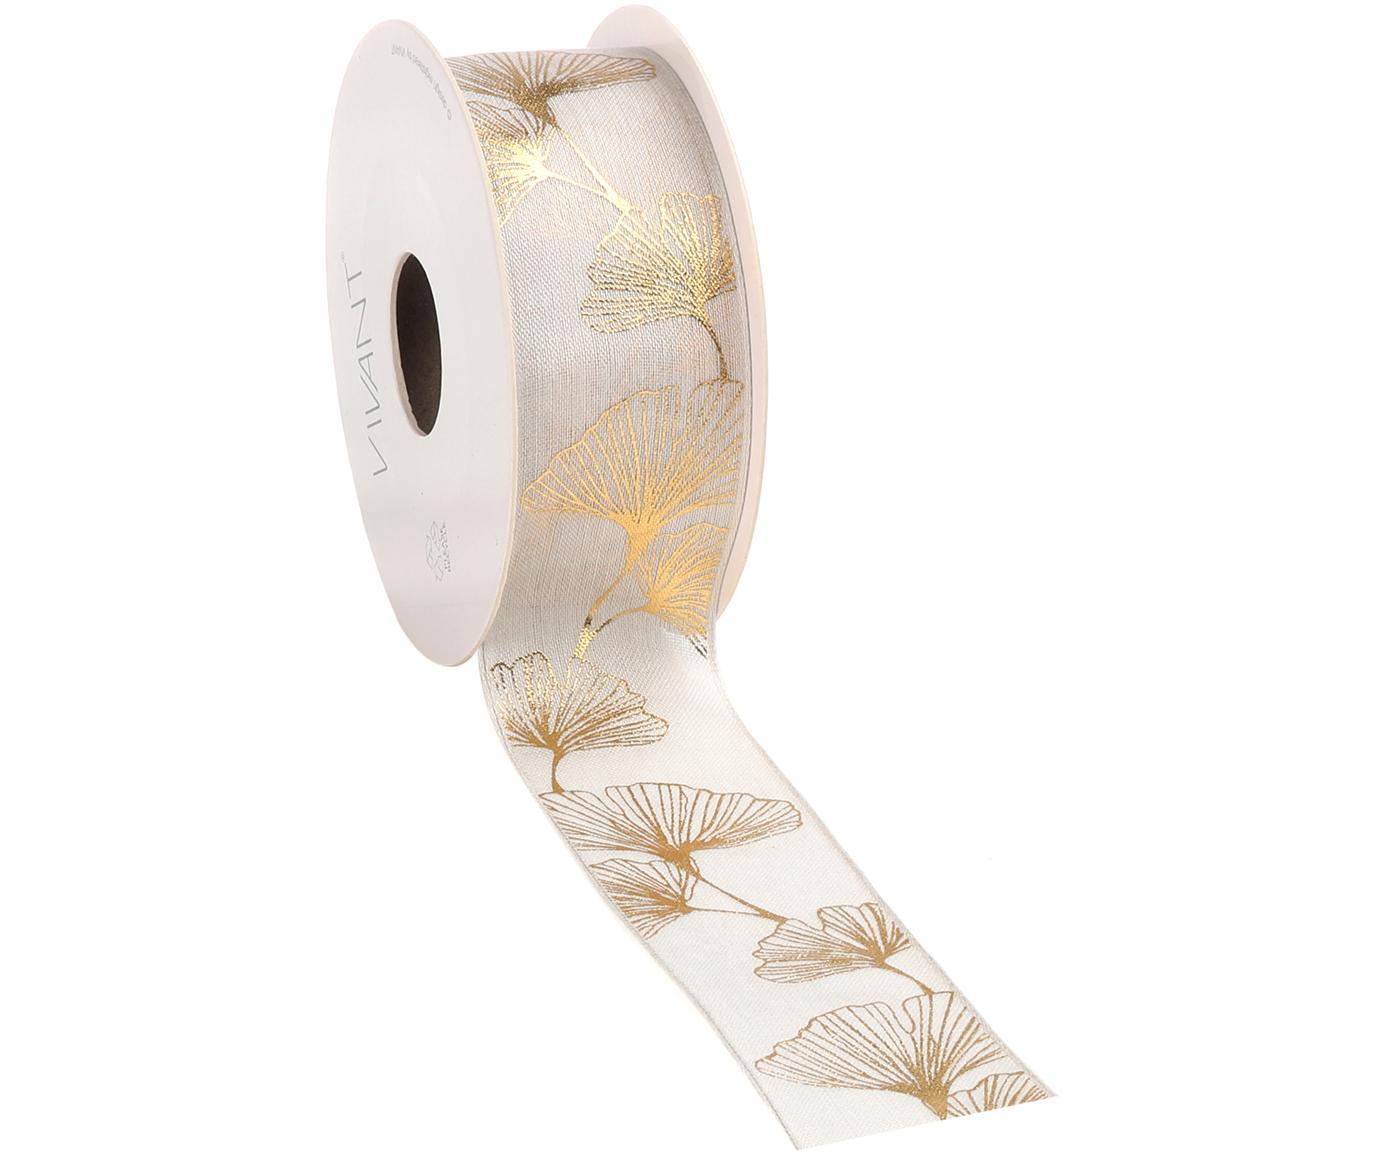 Geschenkband Gingko, 60% Rayon, 35% Polyester, 5% Draht, Weiß, Goldfarben, 4 x 1000 cm